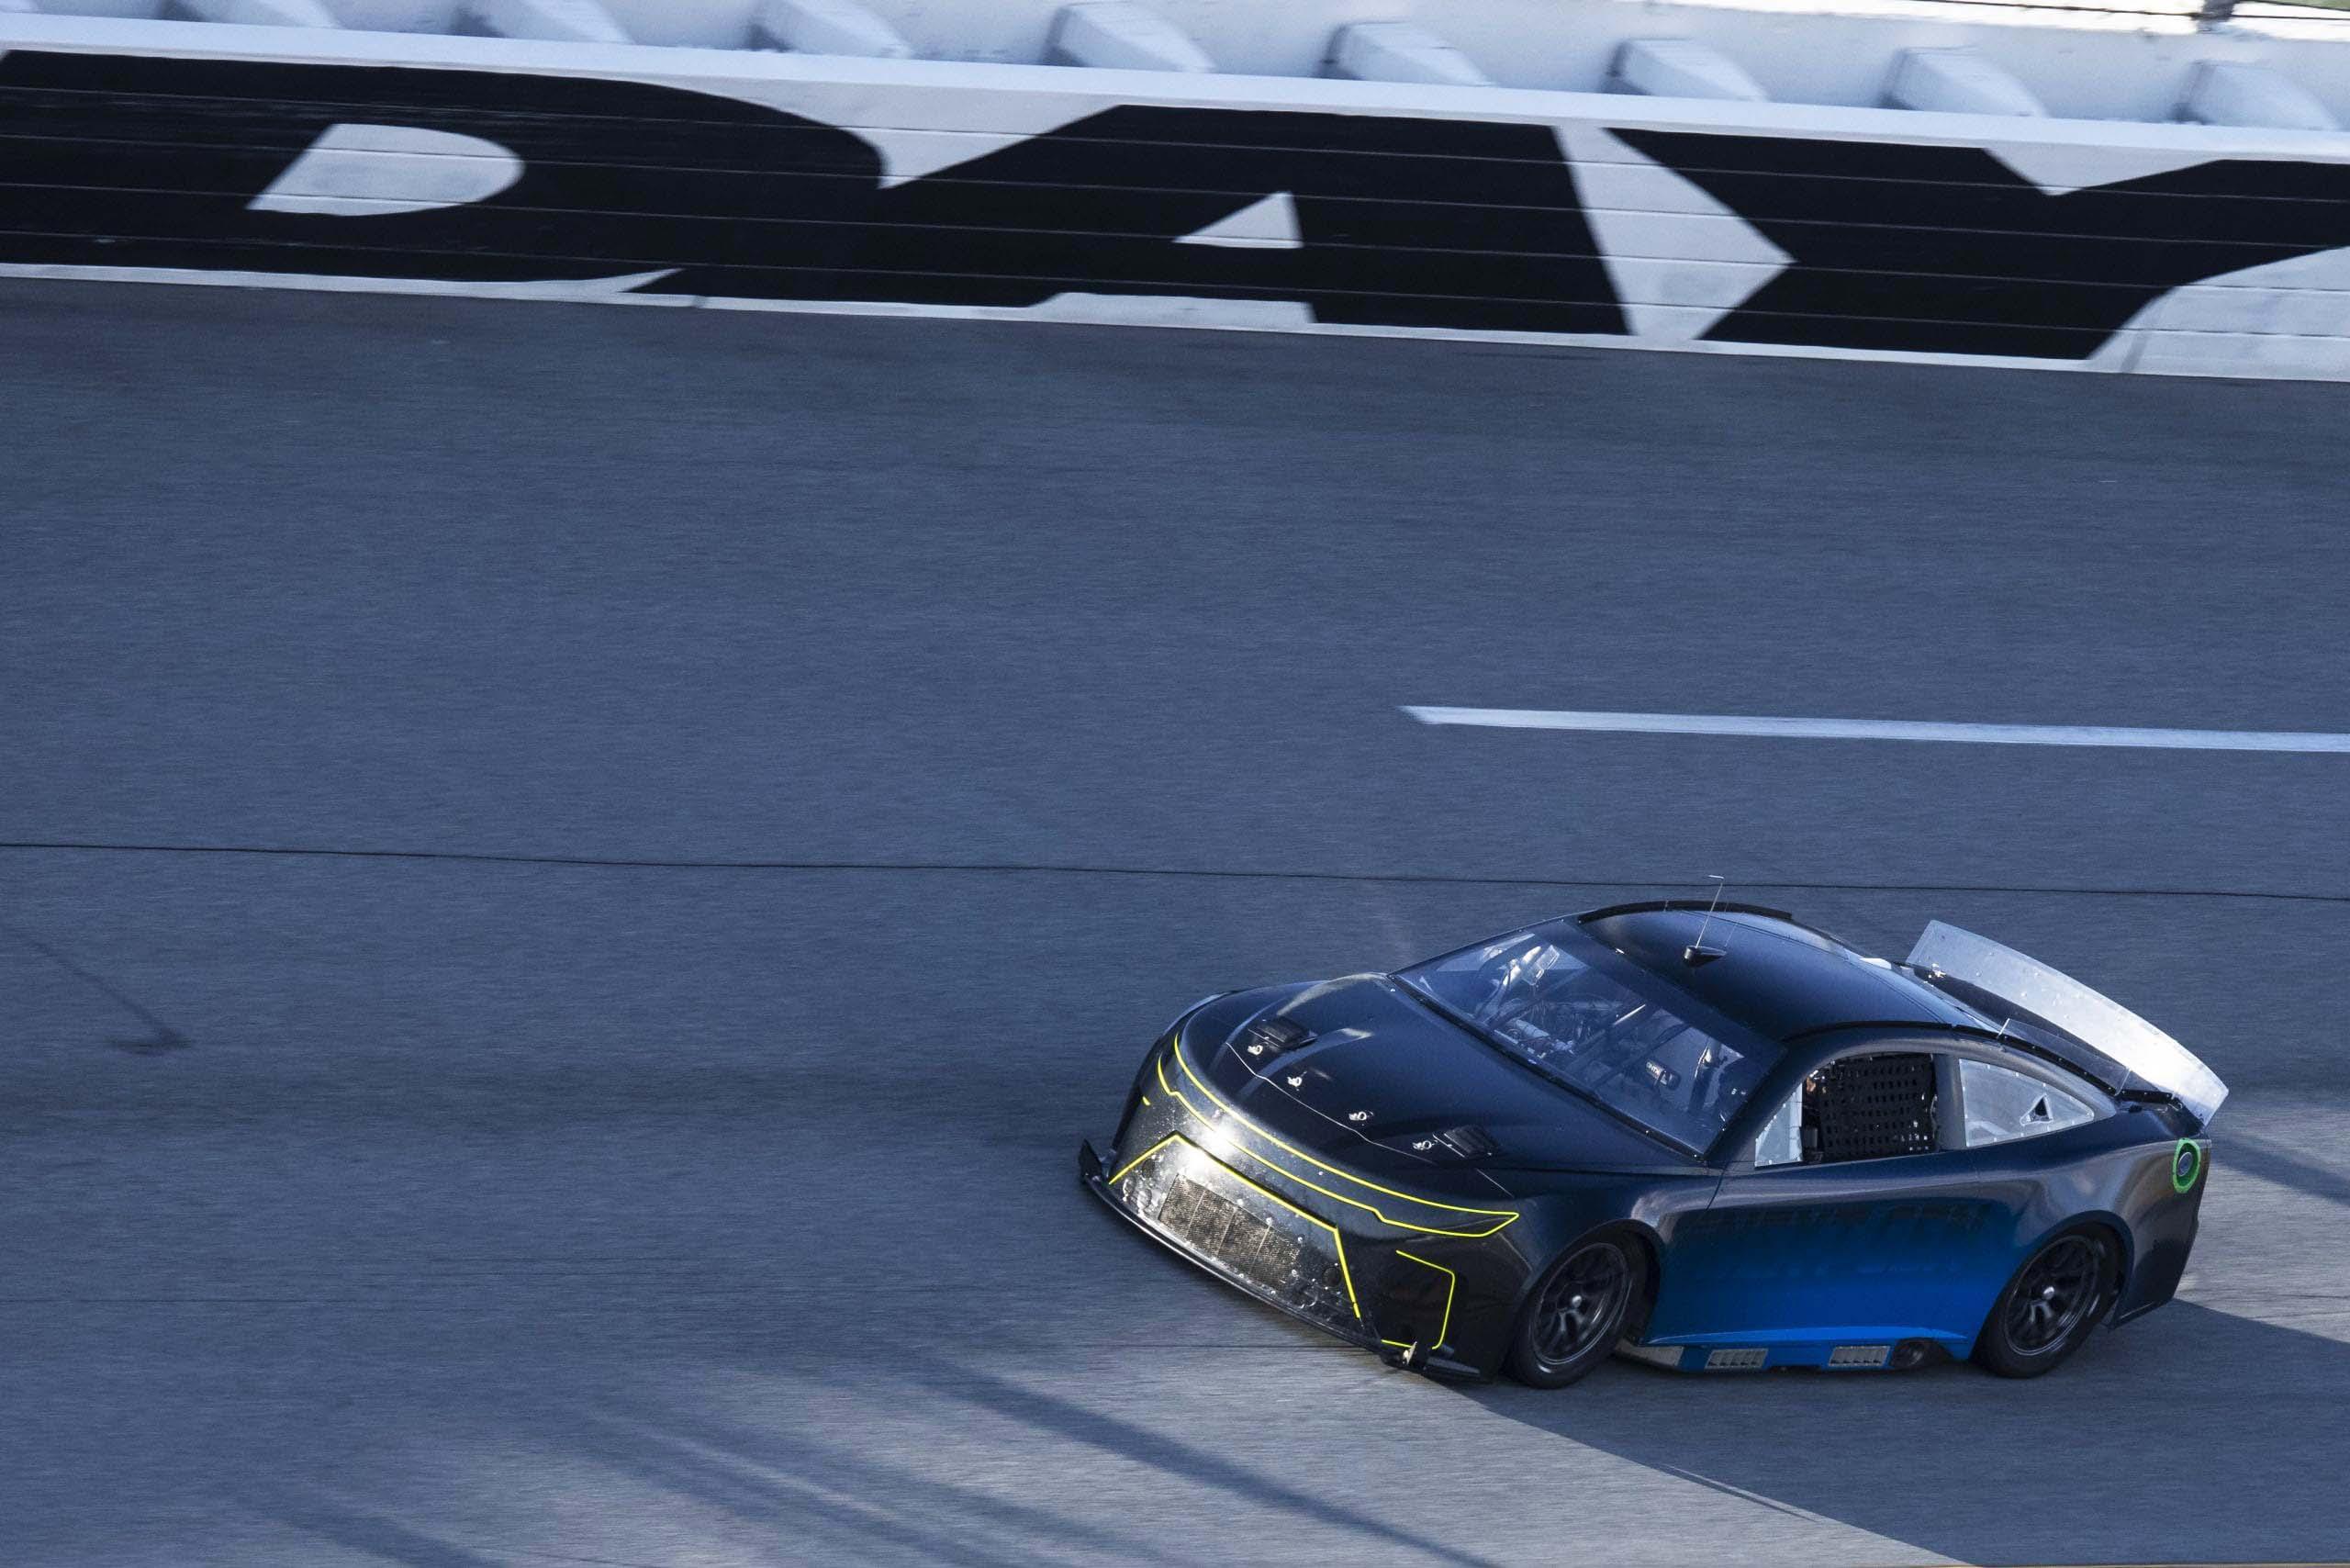 NASCAR Next Gen at Daytona International Speedway